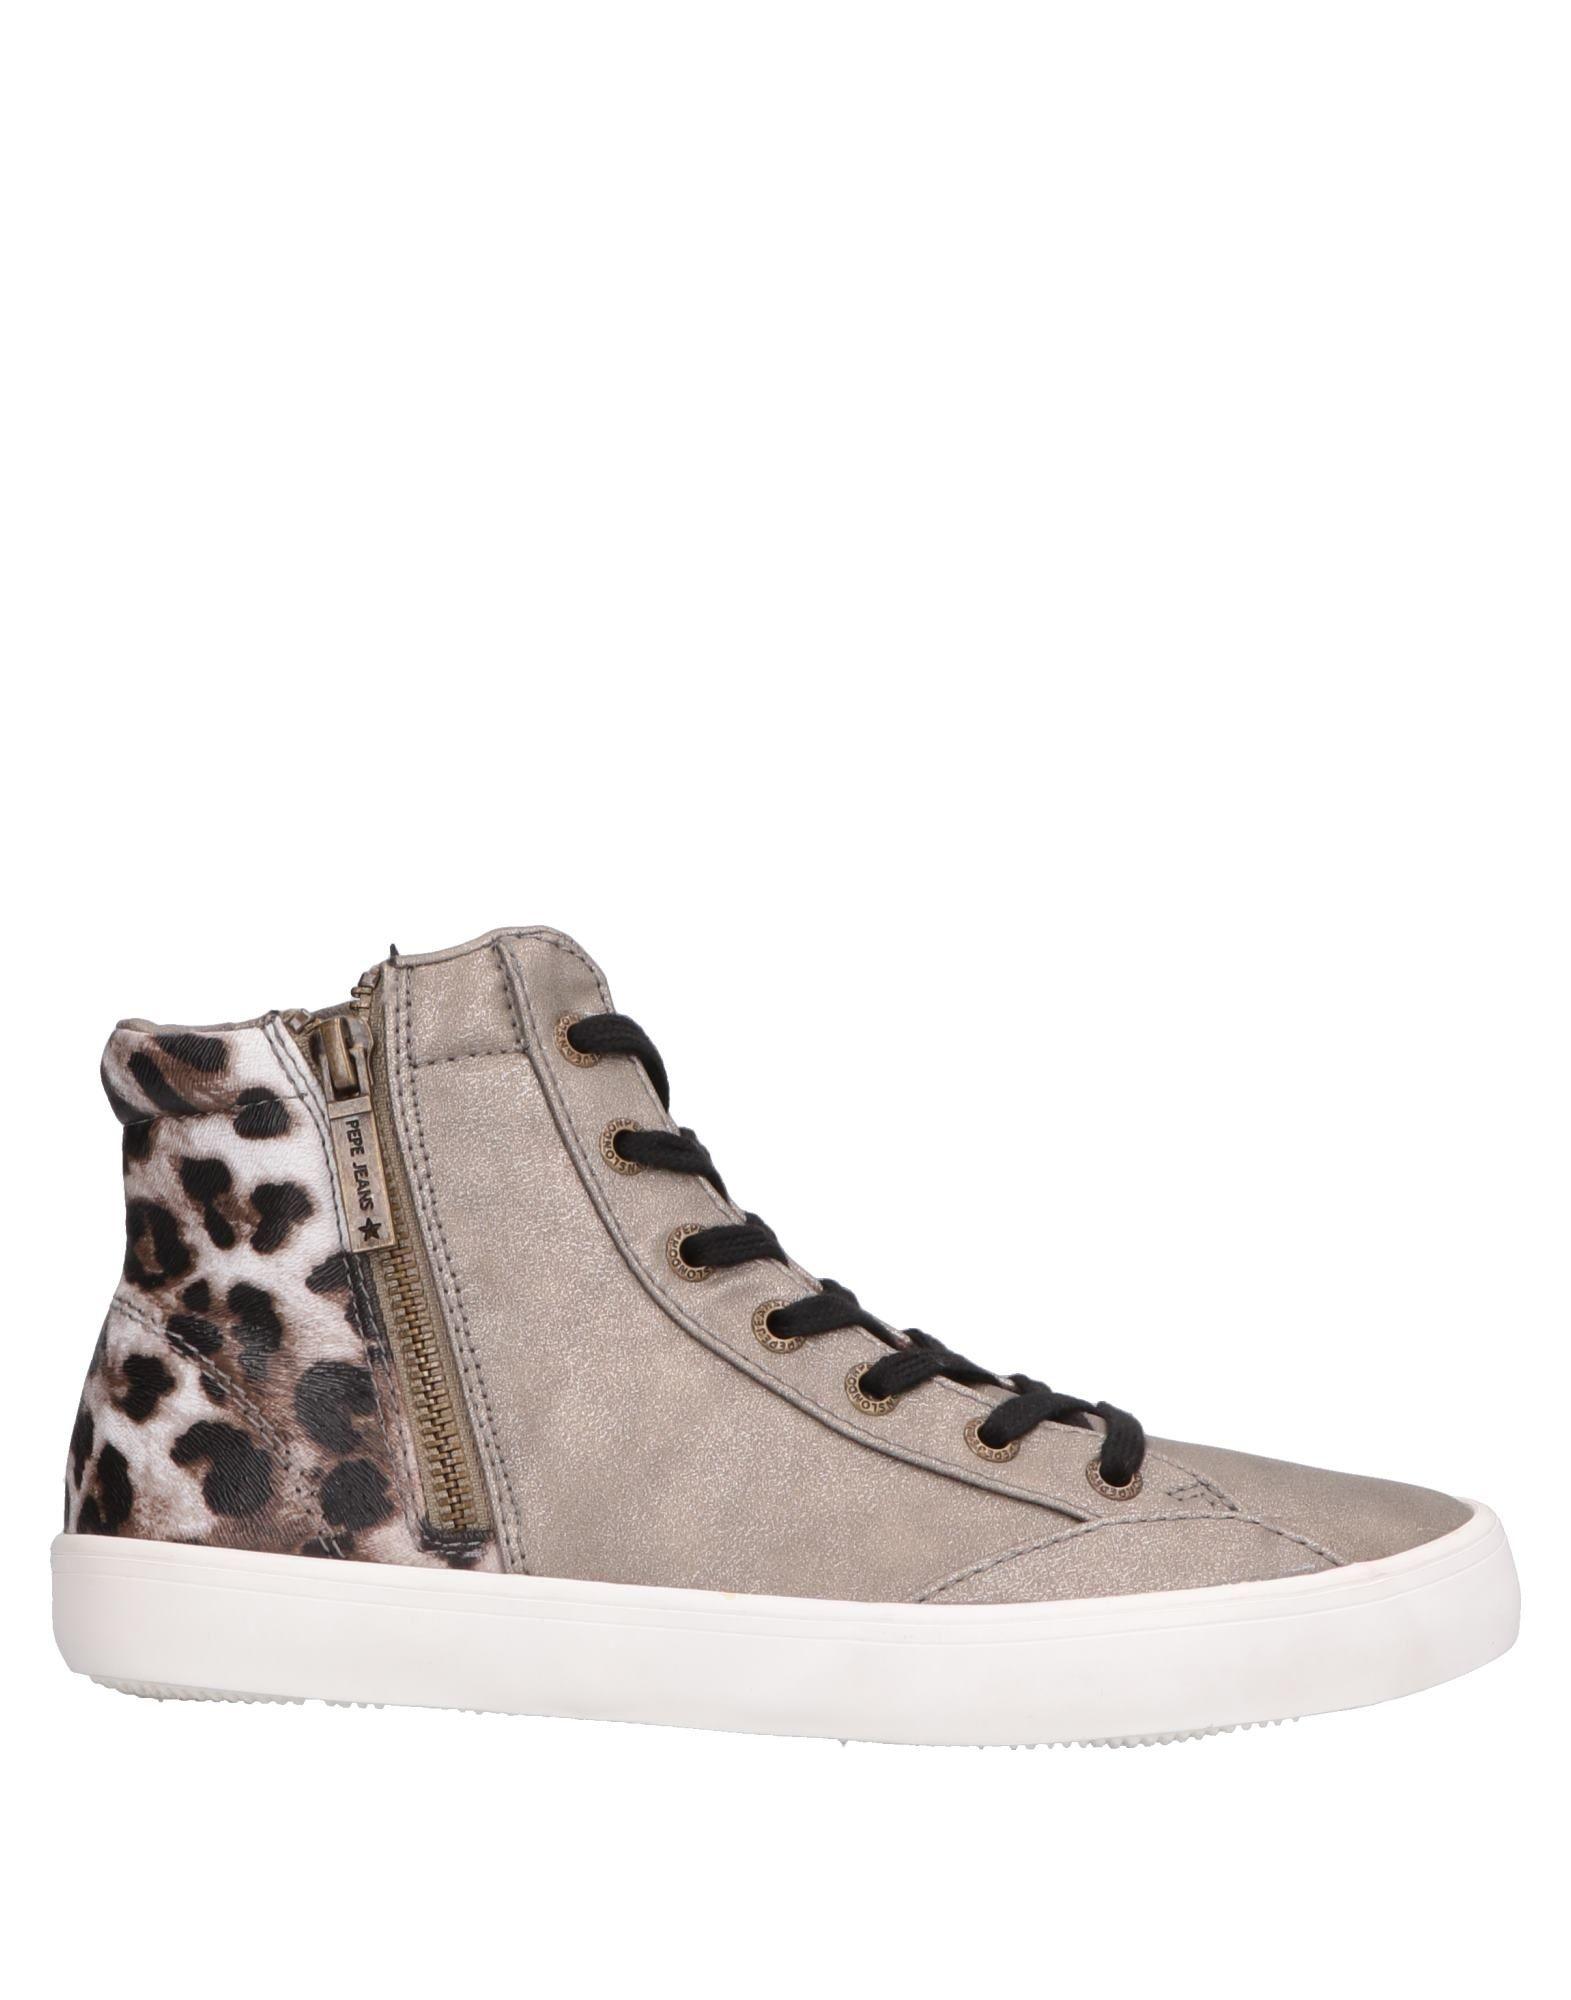 Scarpe da Ginnastica Pepe Jeans Donna - 11577872EA